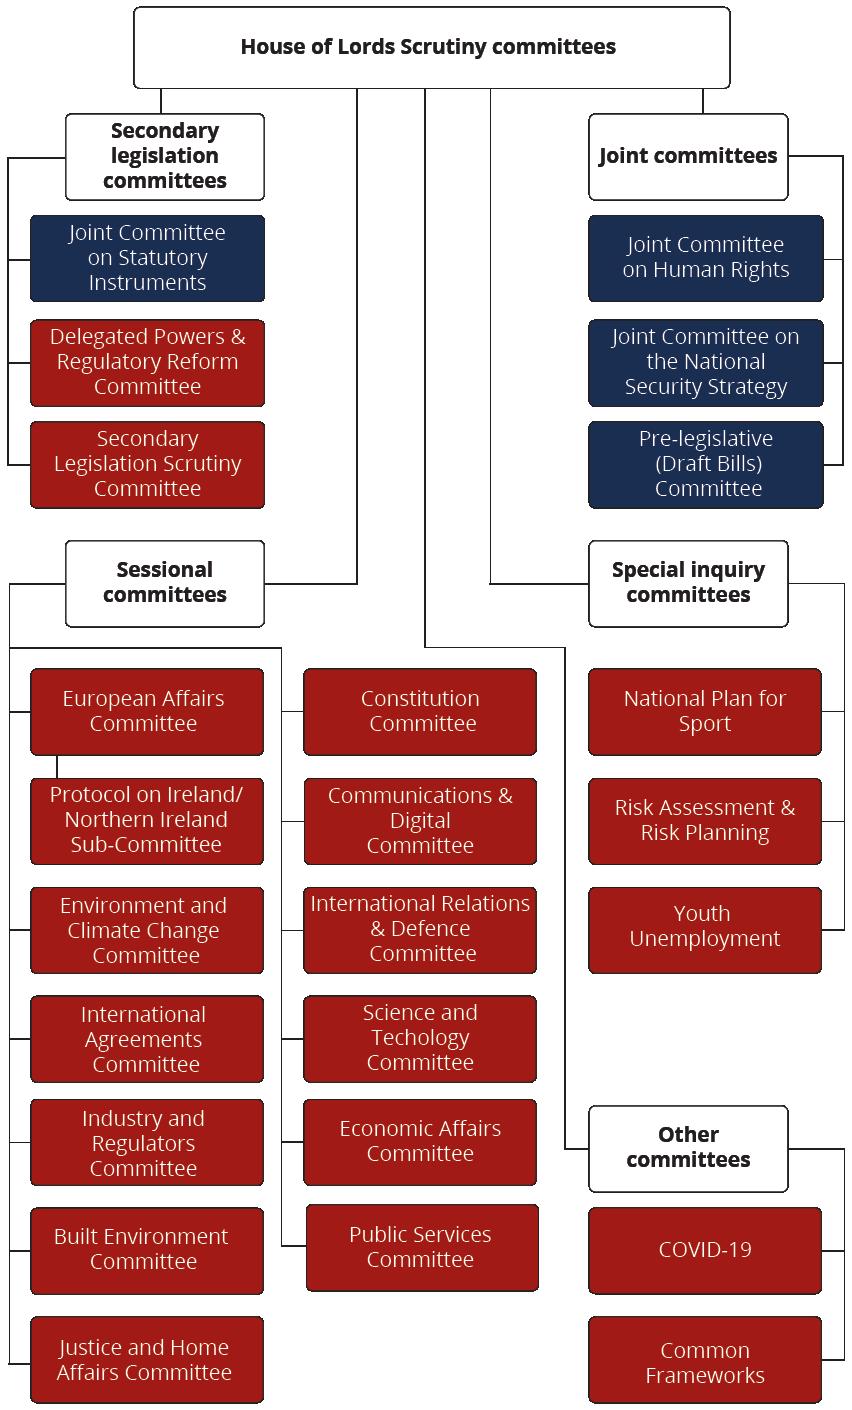 House of Lords organogram